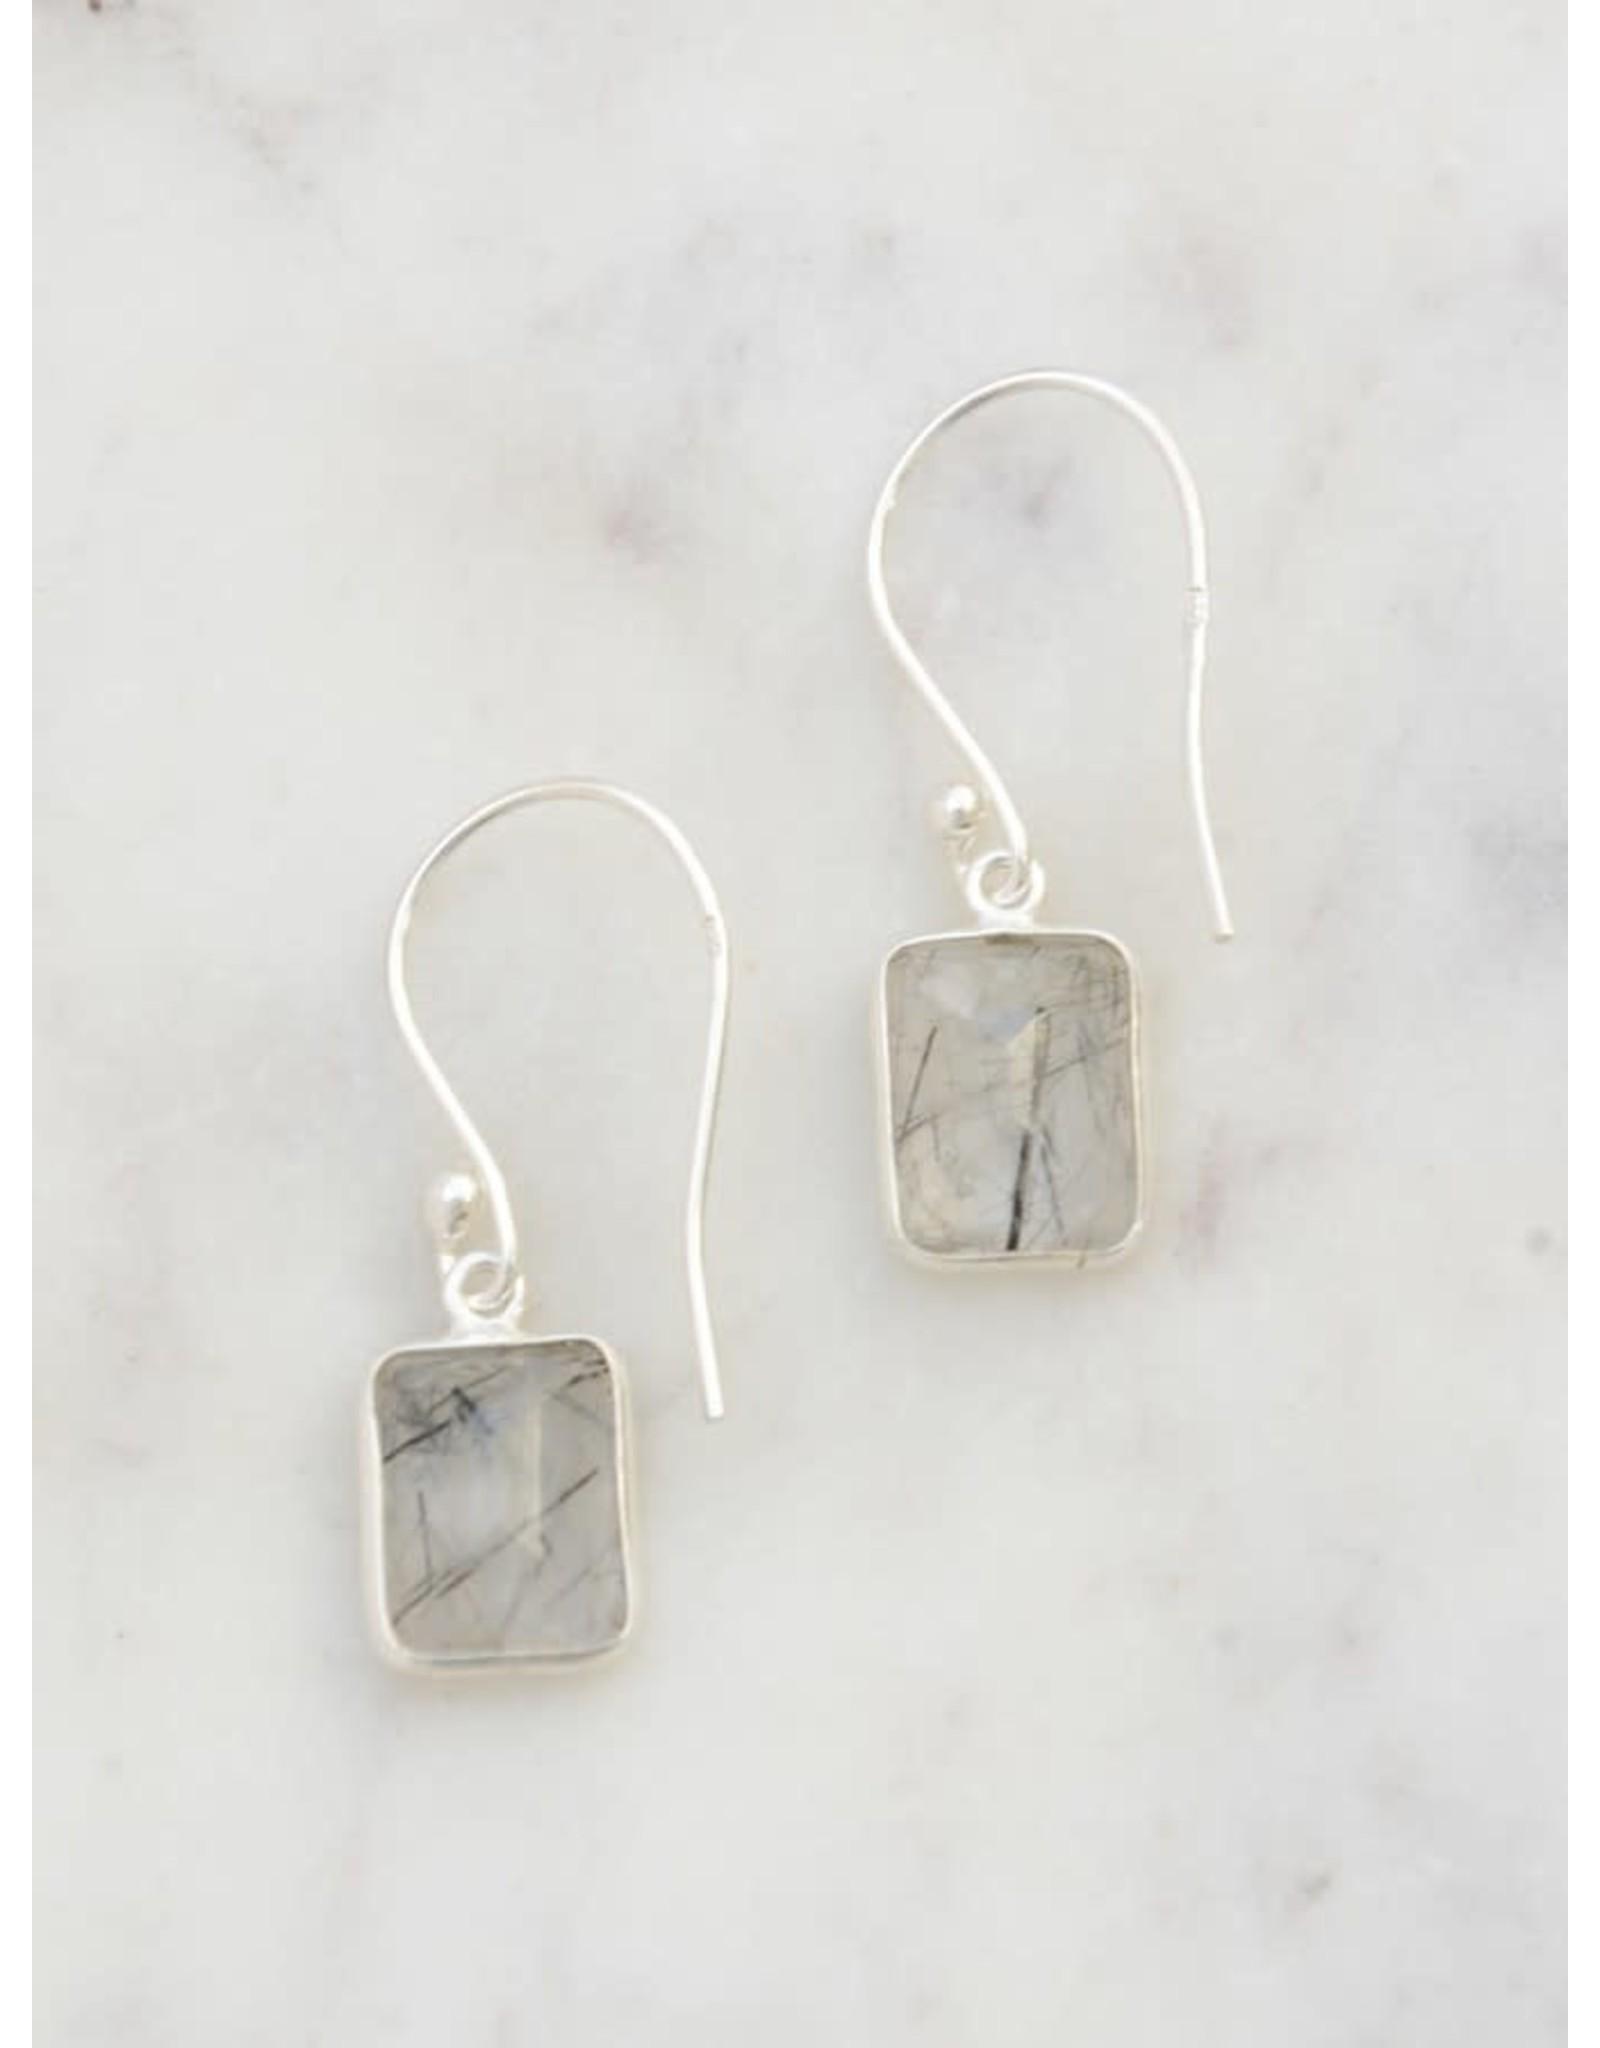 Stone Window Sterling Earrings, Black Rutile, India